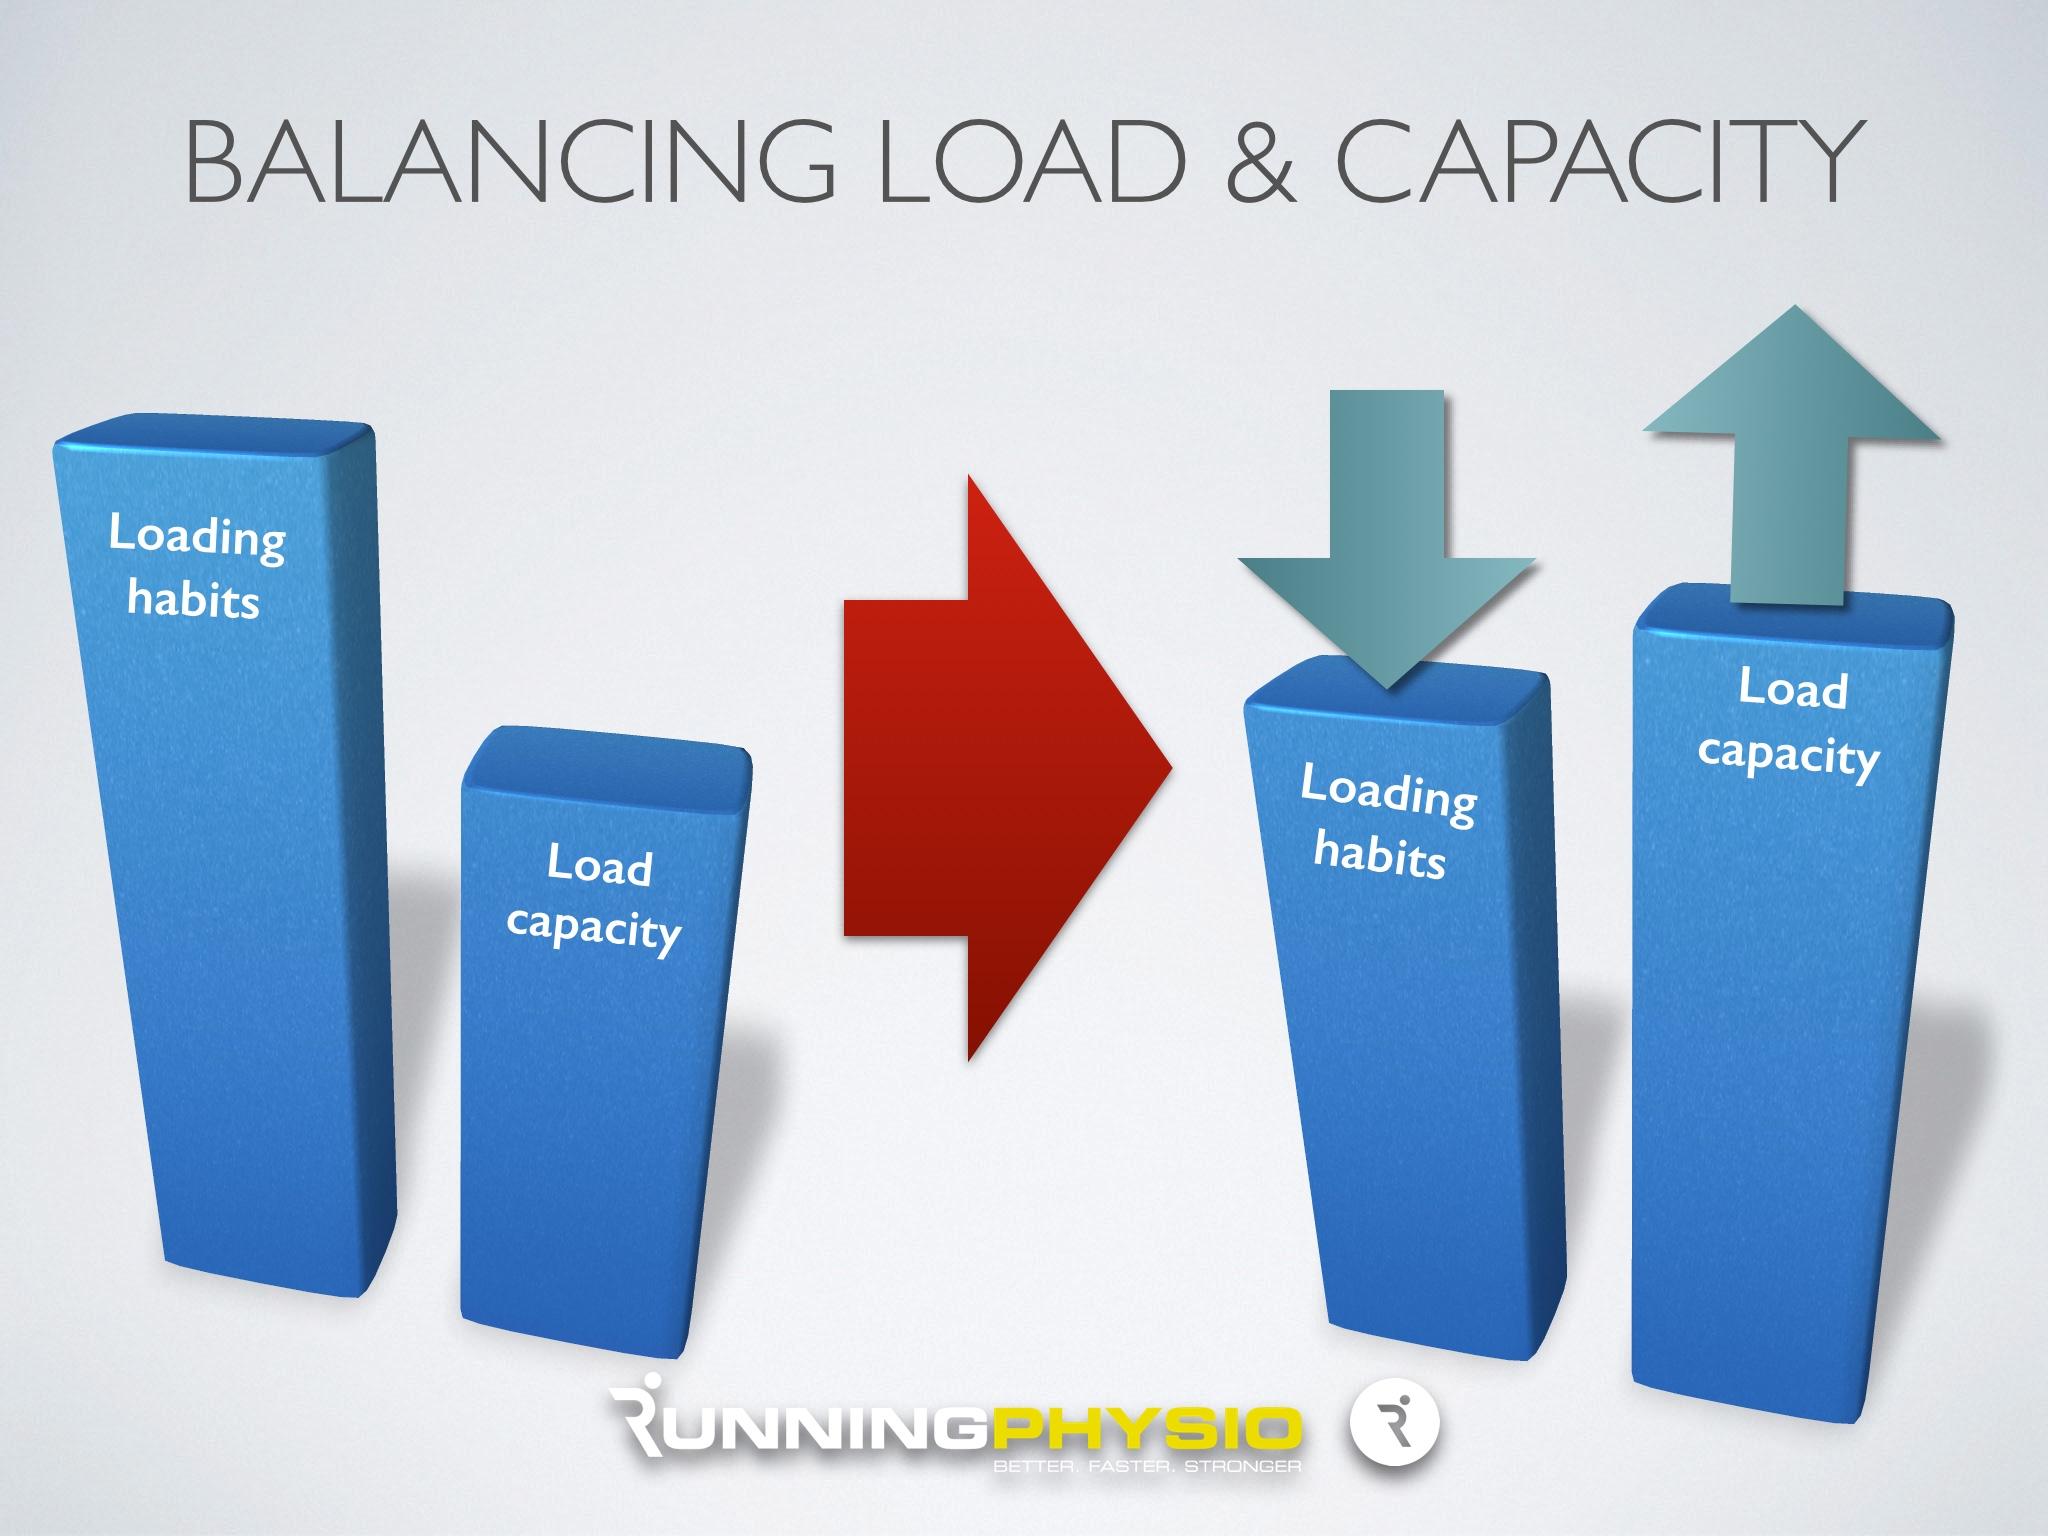 Balancing training load and tissue capacity | BJSM blog - social media's leading SEM voice